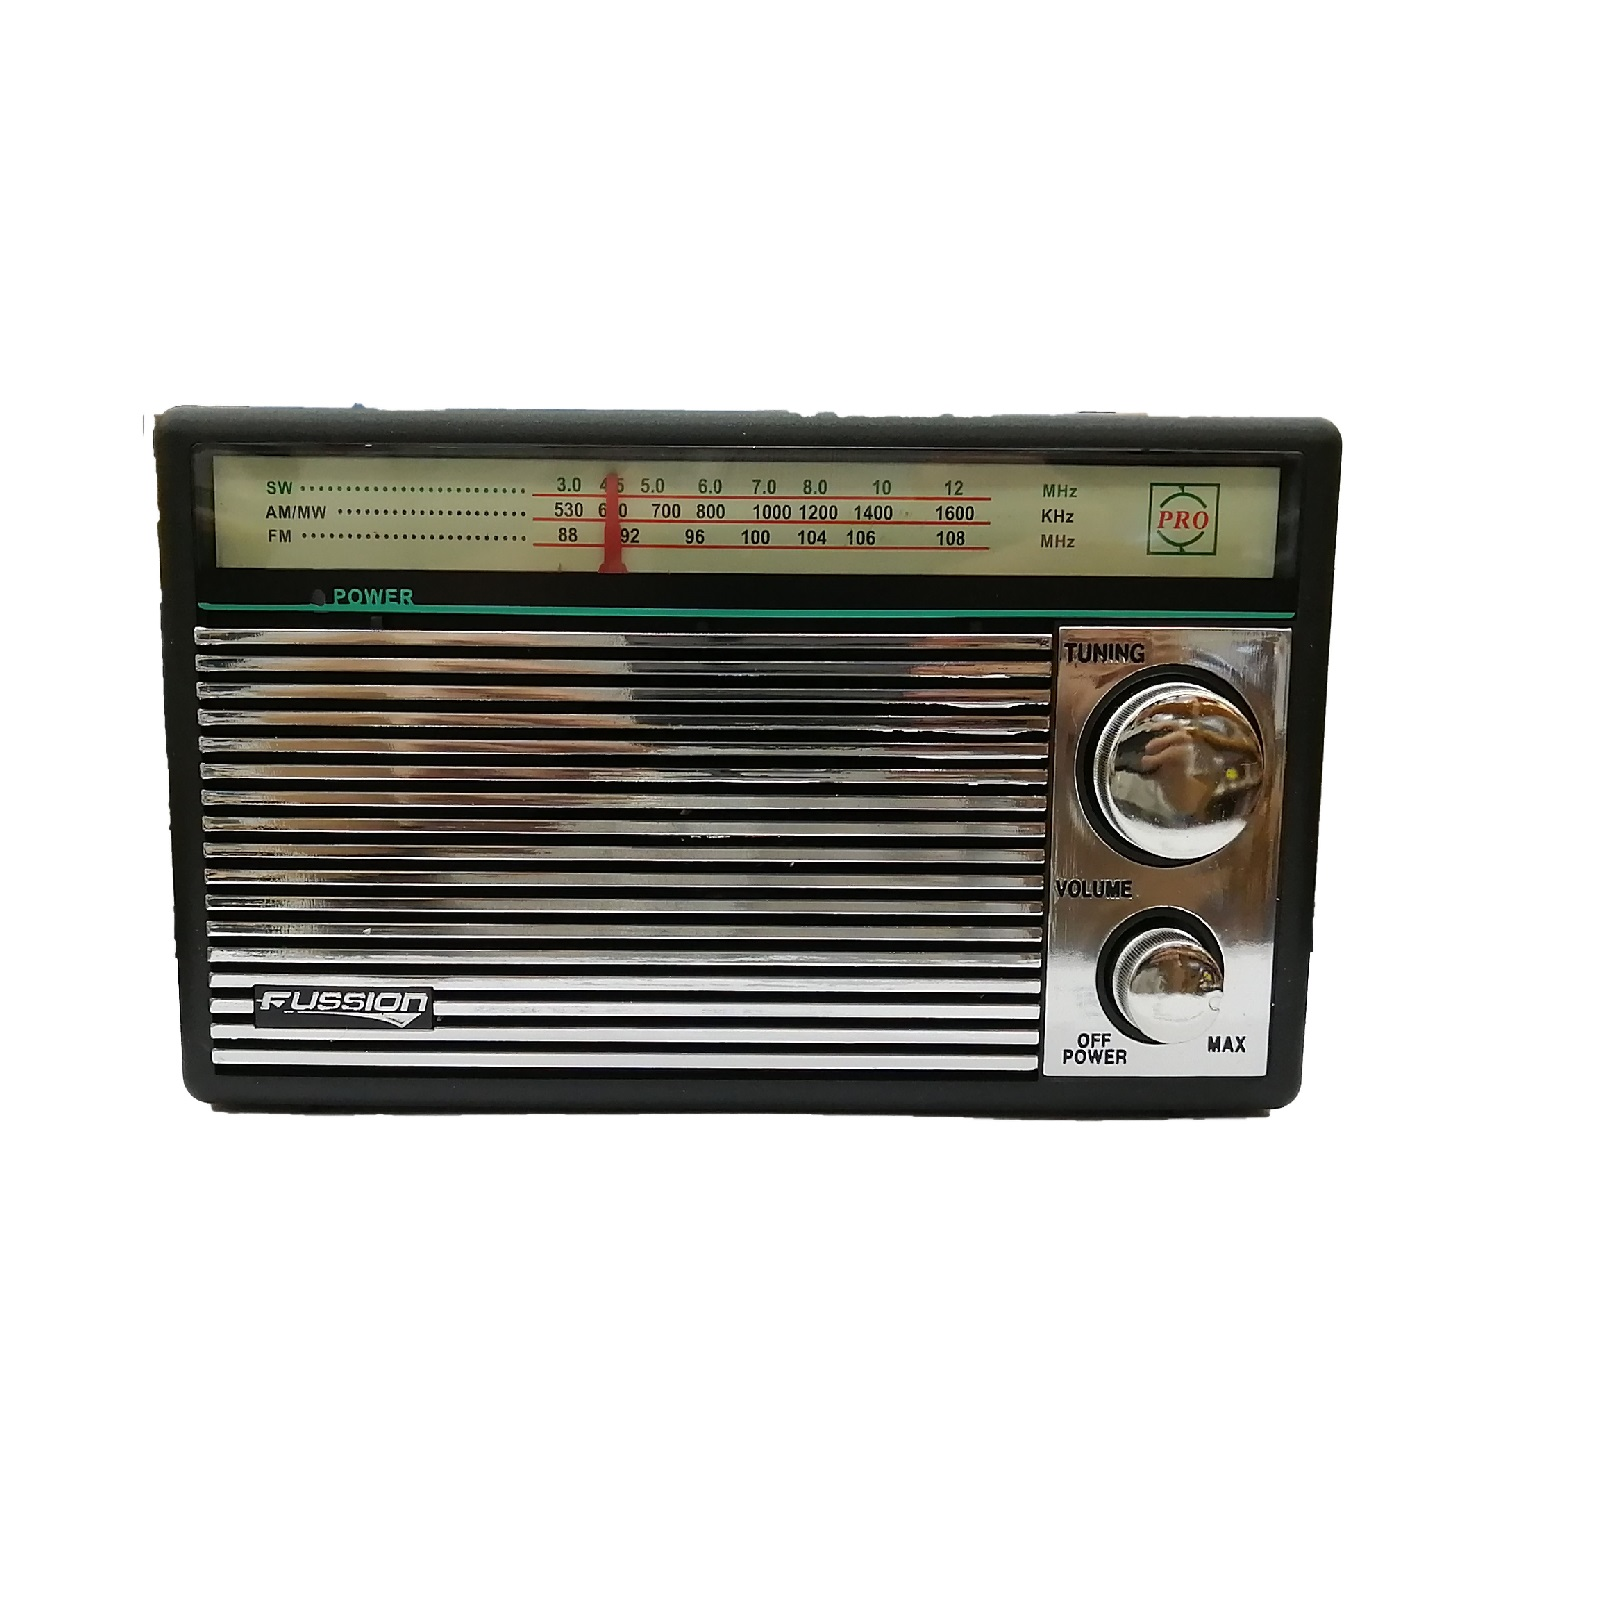 RADIO FM FUSSION